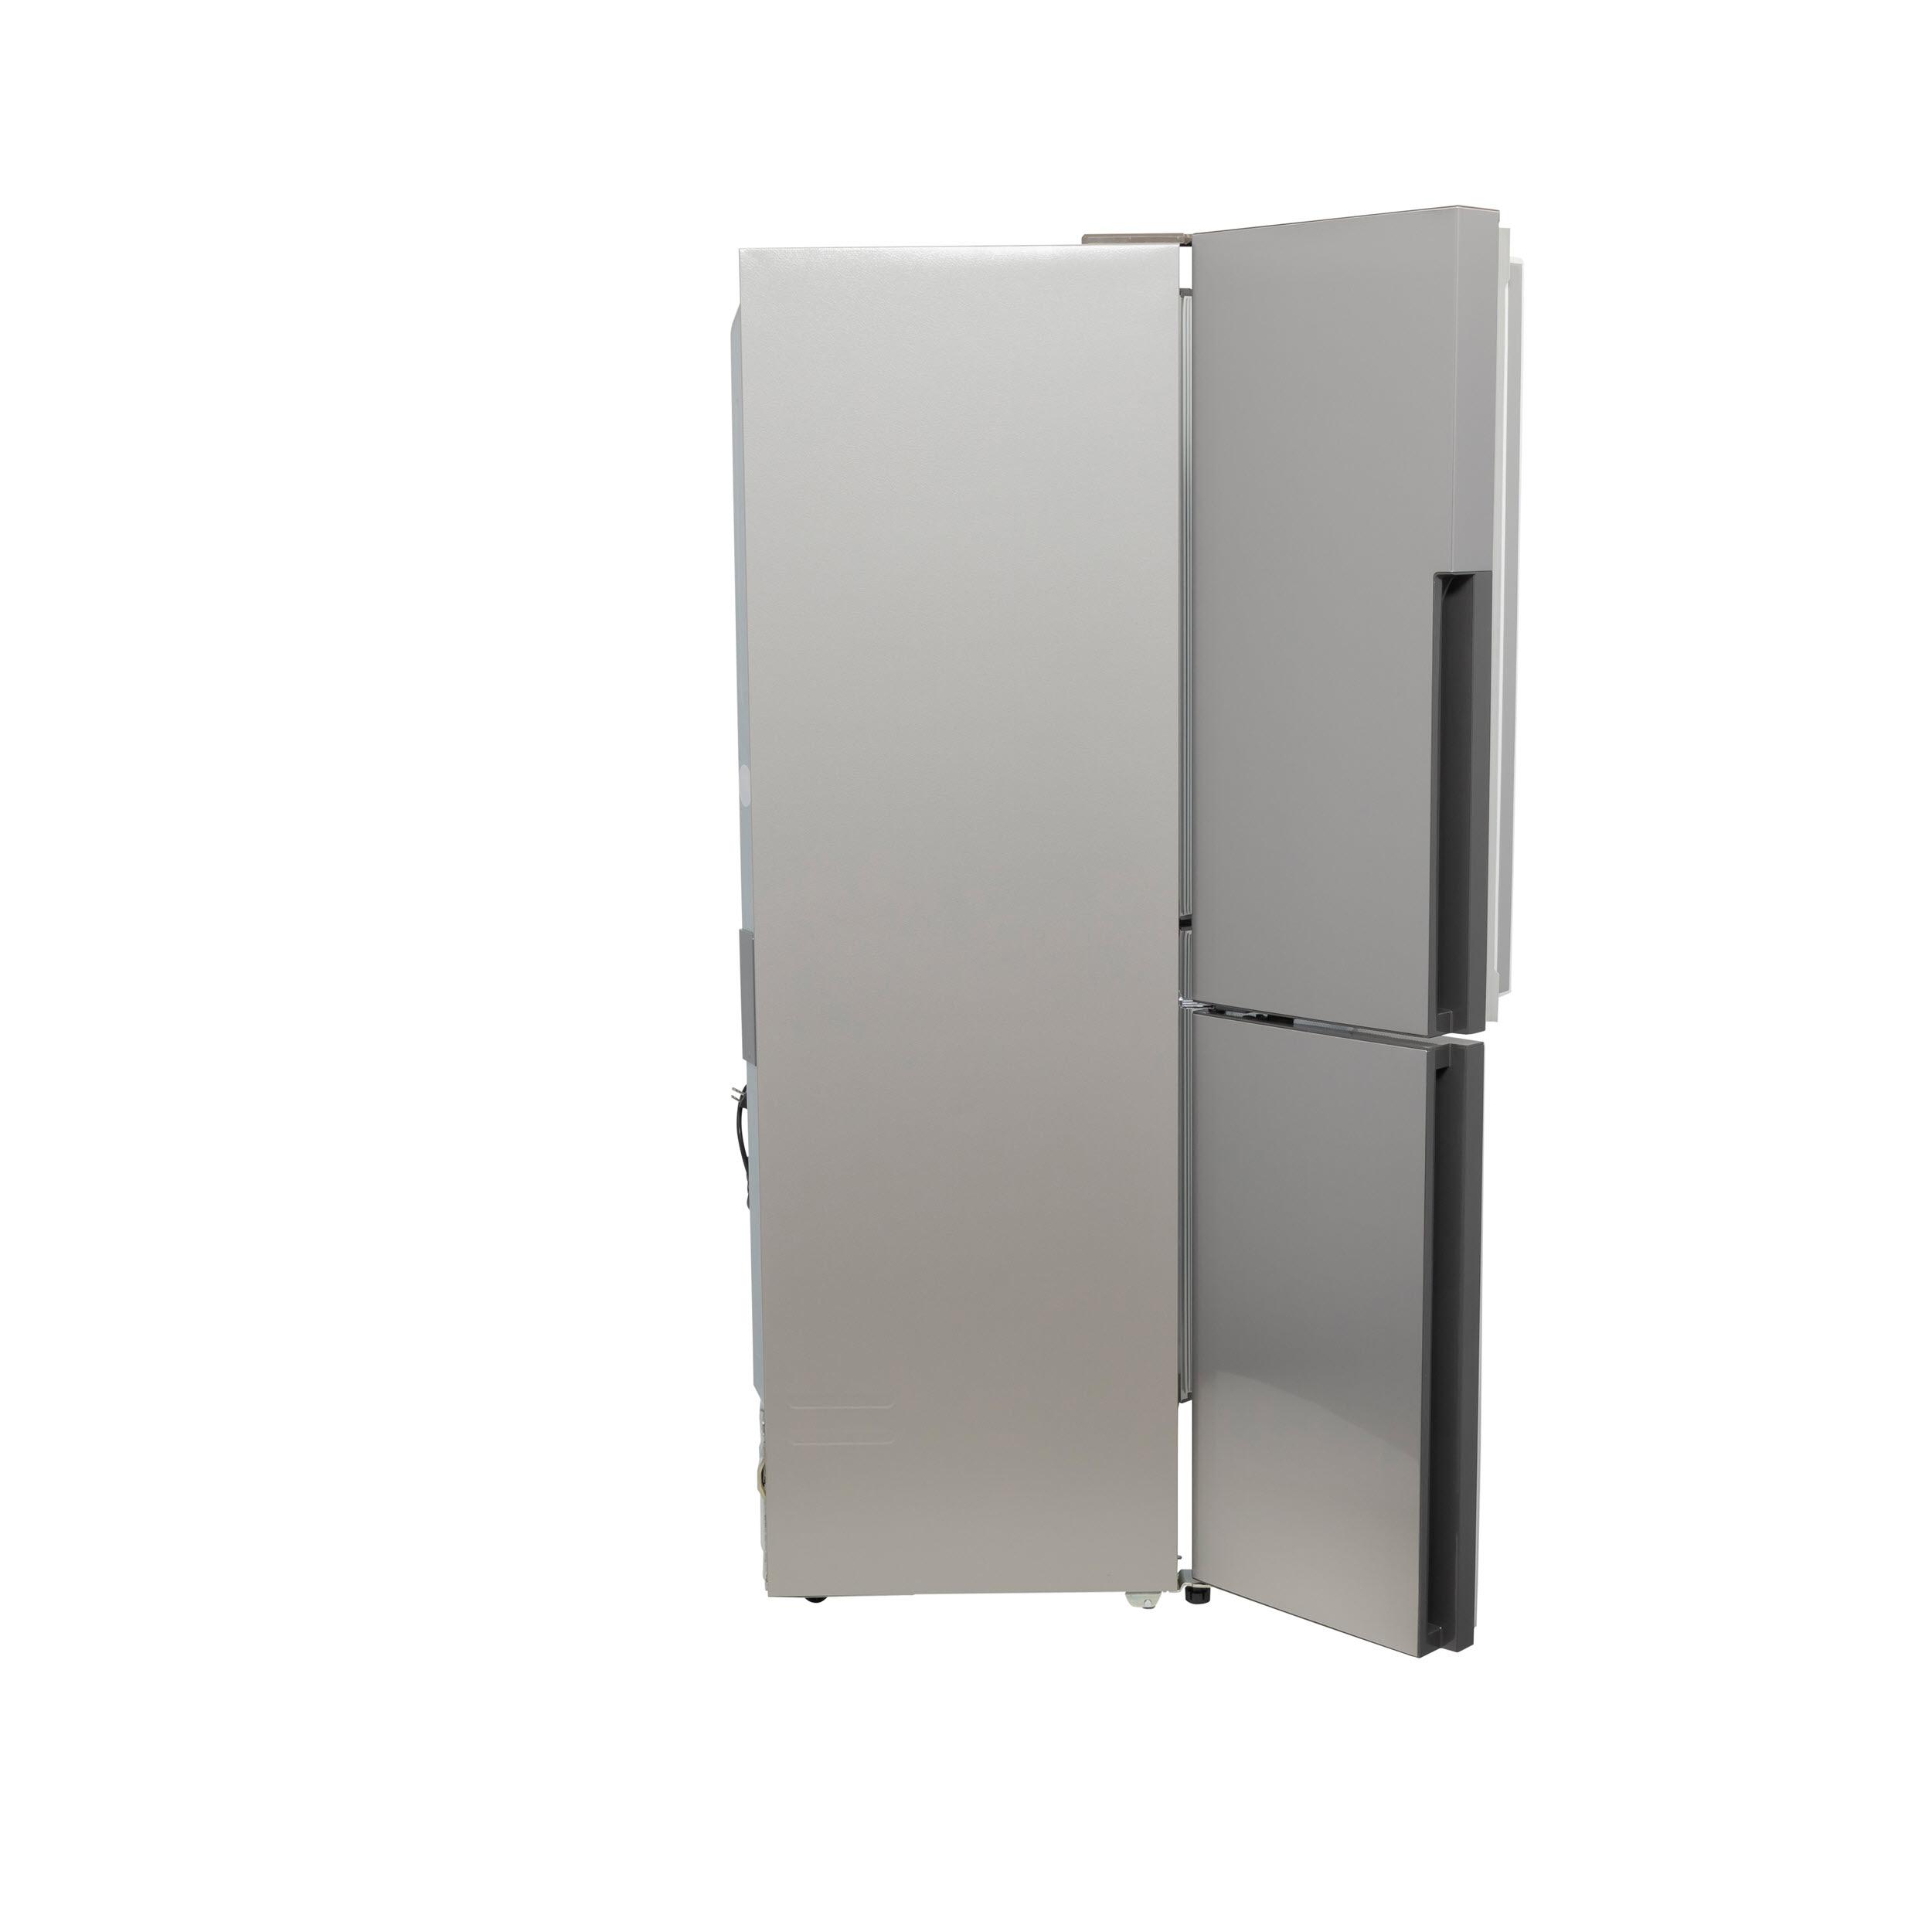 Model: QHE16HYPFS   Haier 16.4 Cu. Ft. Quad Door Refrigerator